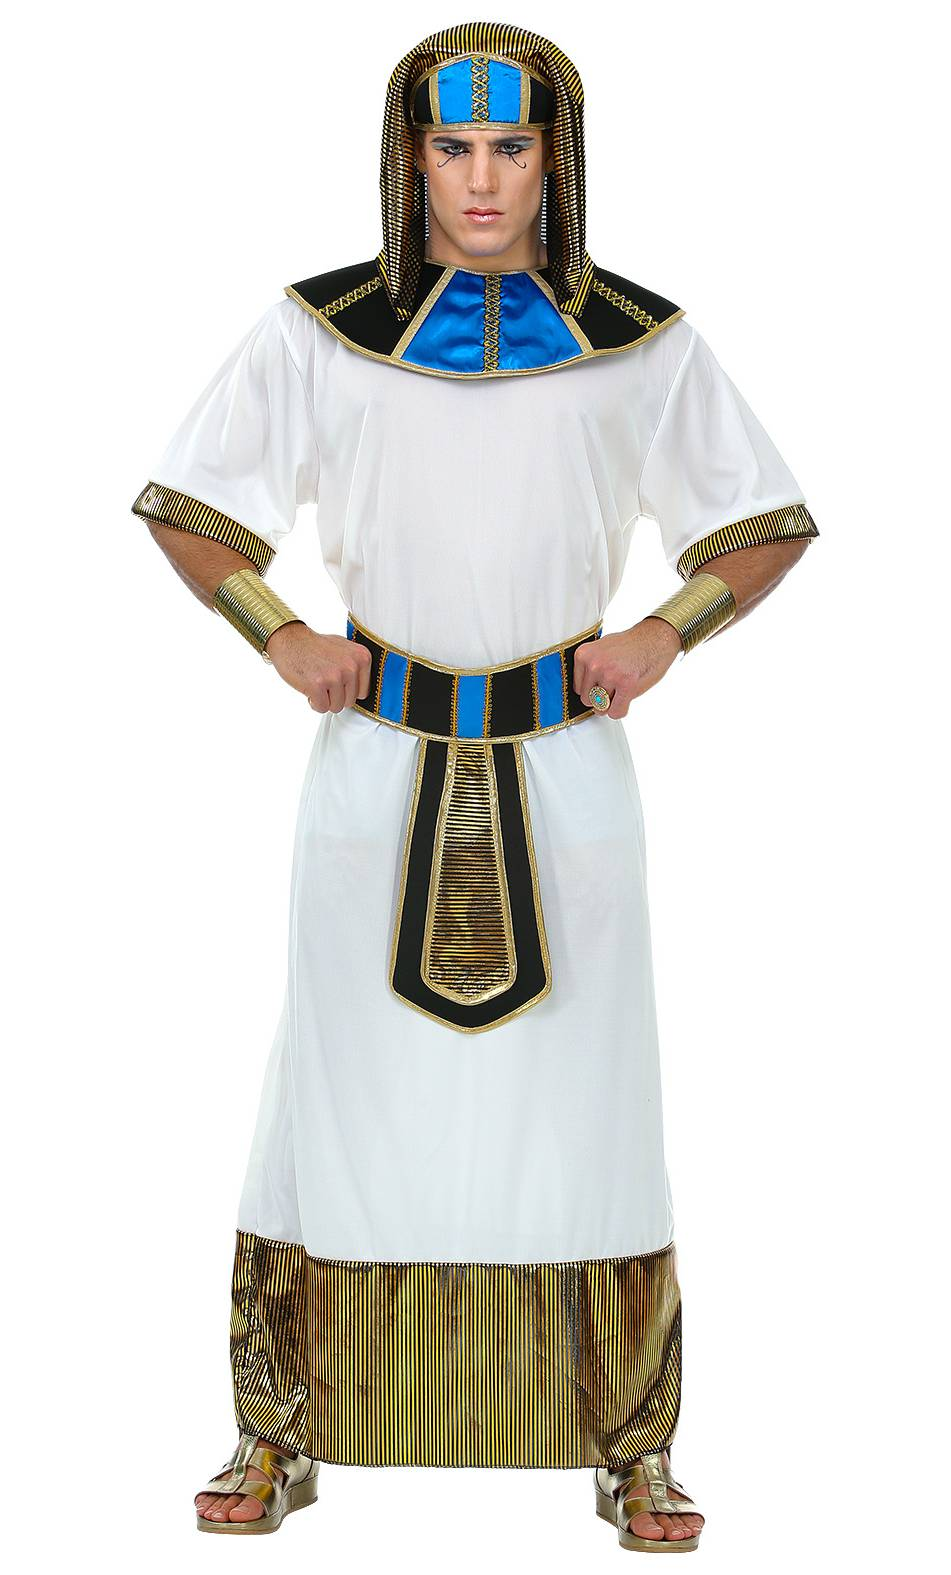 Costume-Pharaon-Egyptien-XL